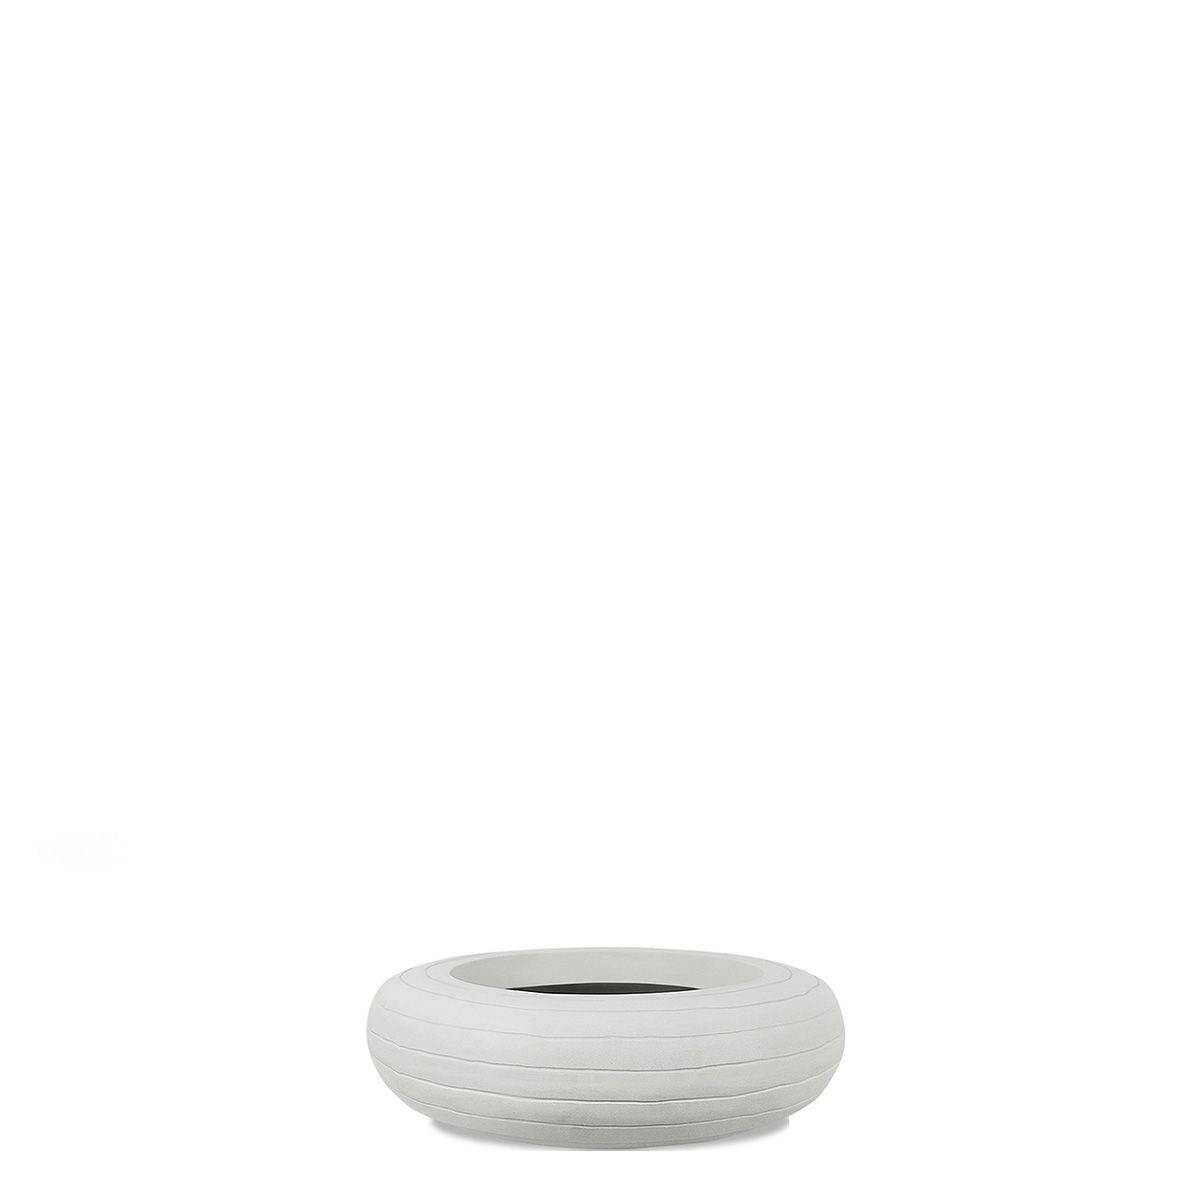 Vaso Relevo Bowl 23 x 10 cm - VASART